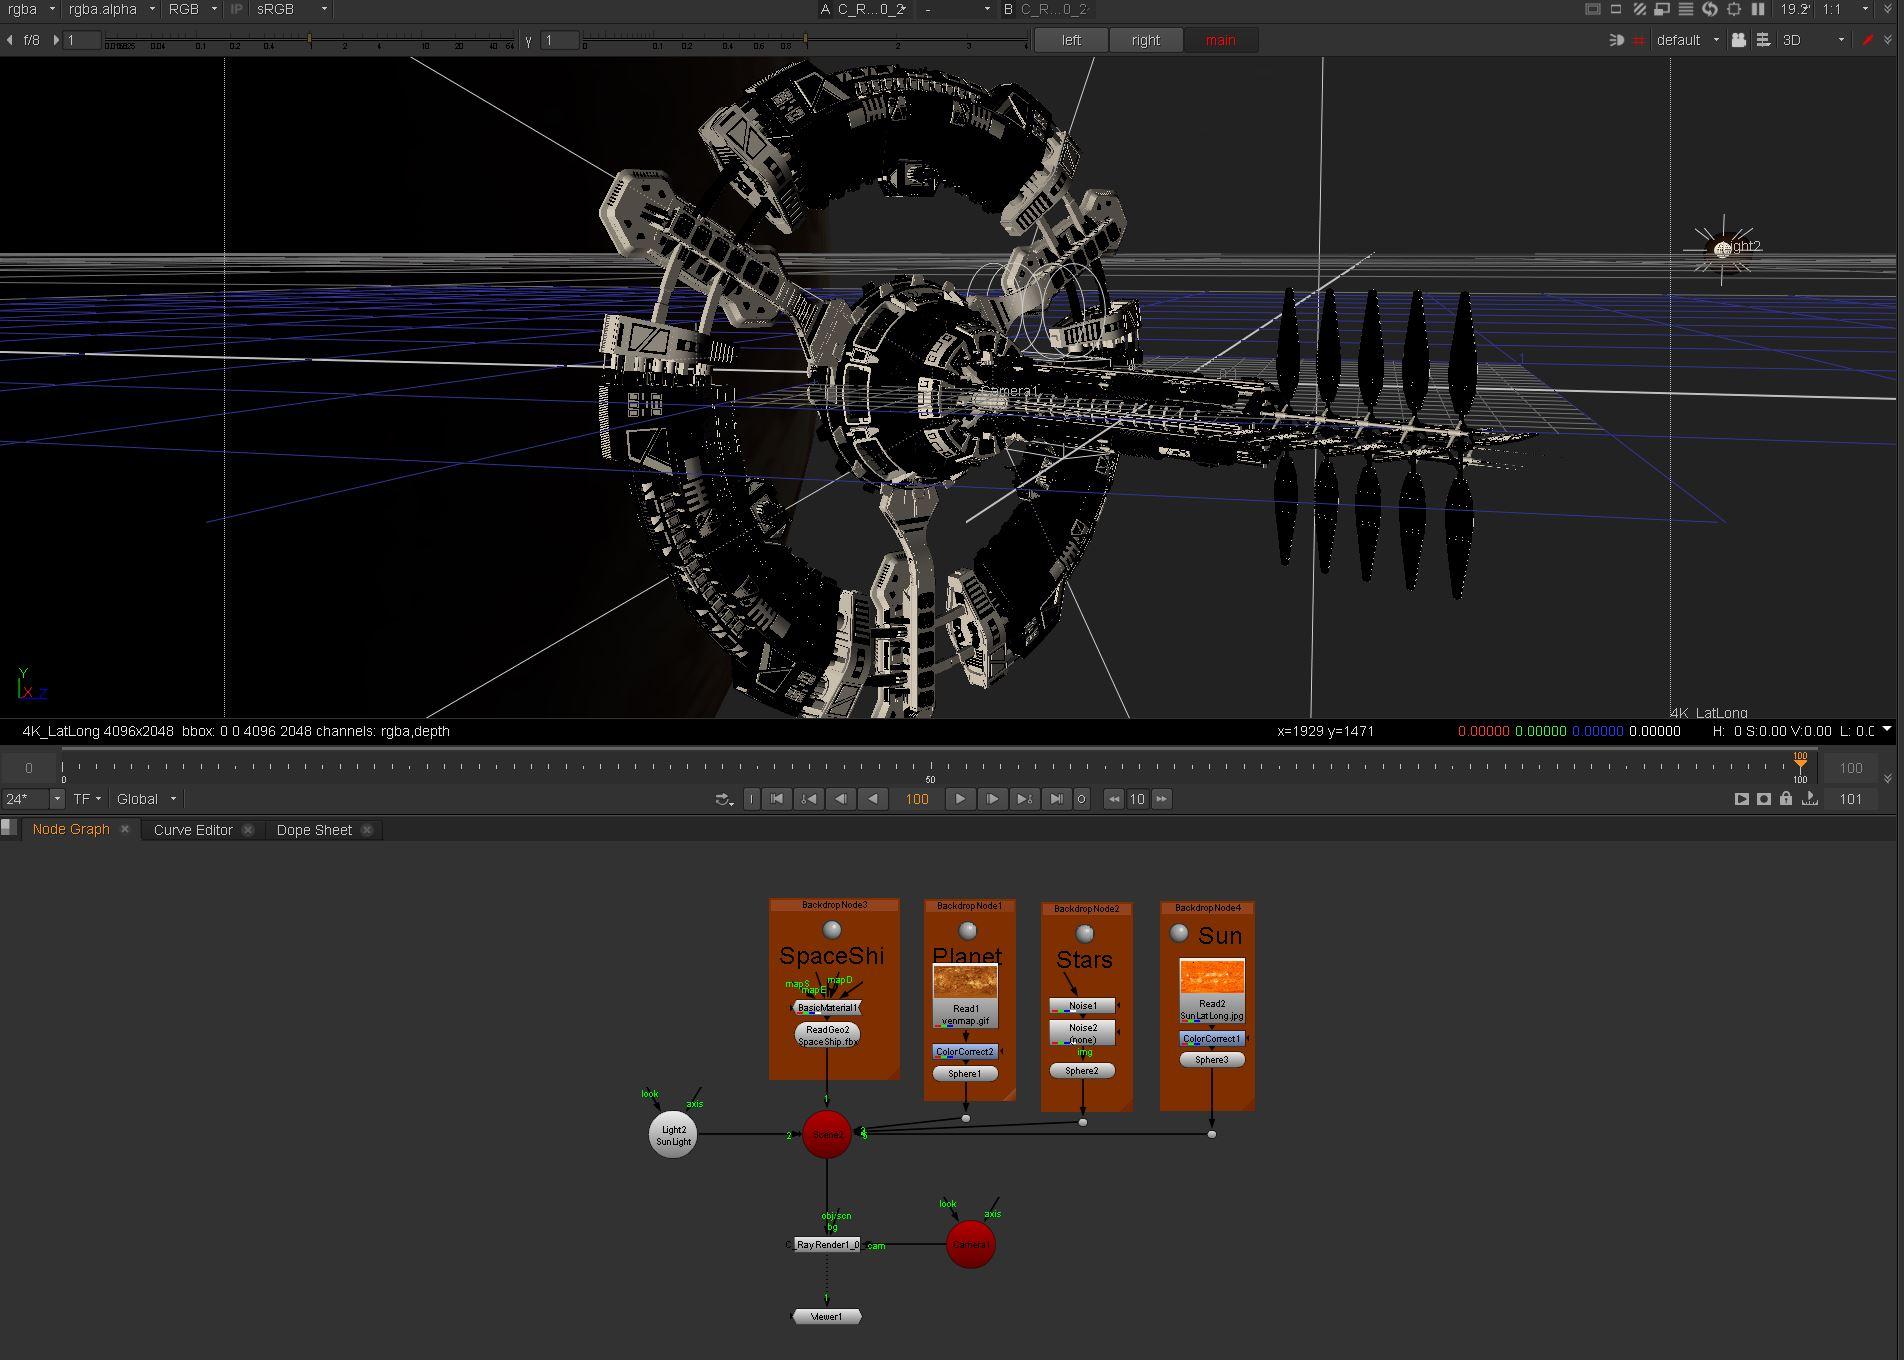 CARA VR plugin for Nuke – fxguide